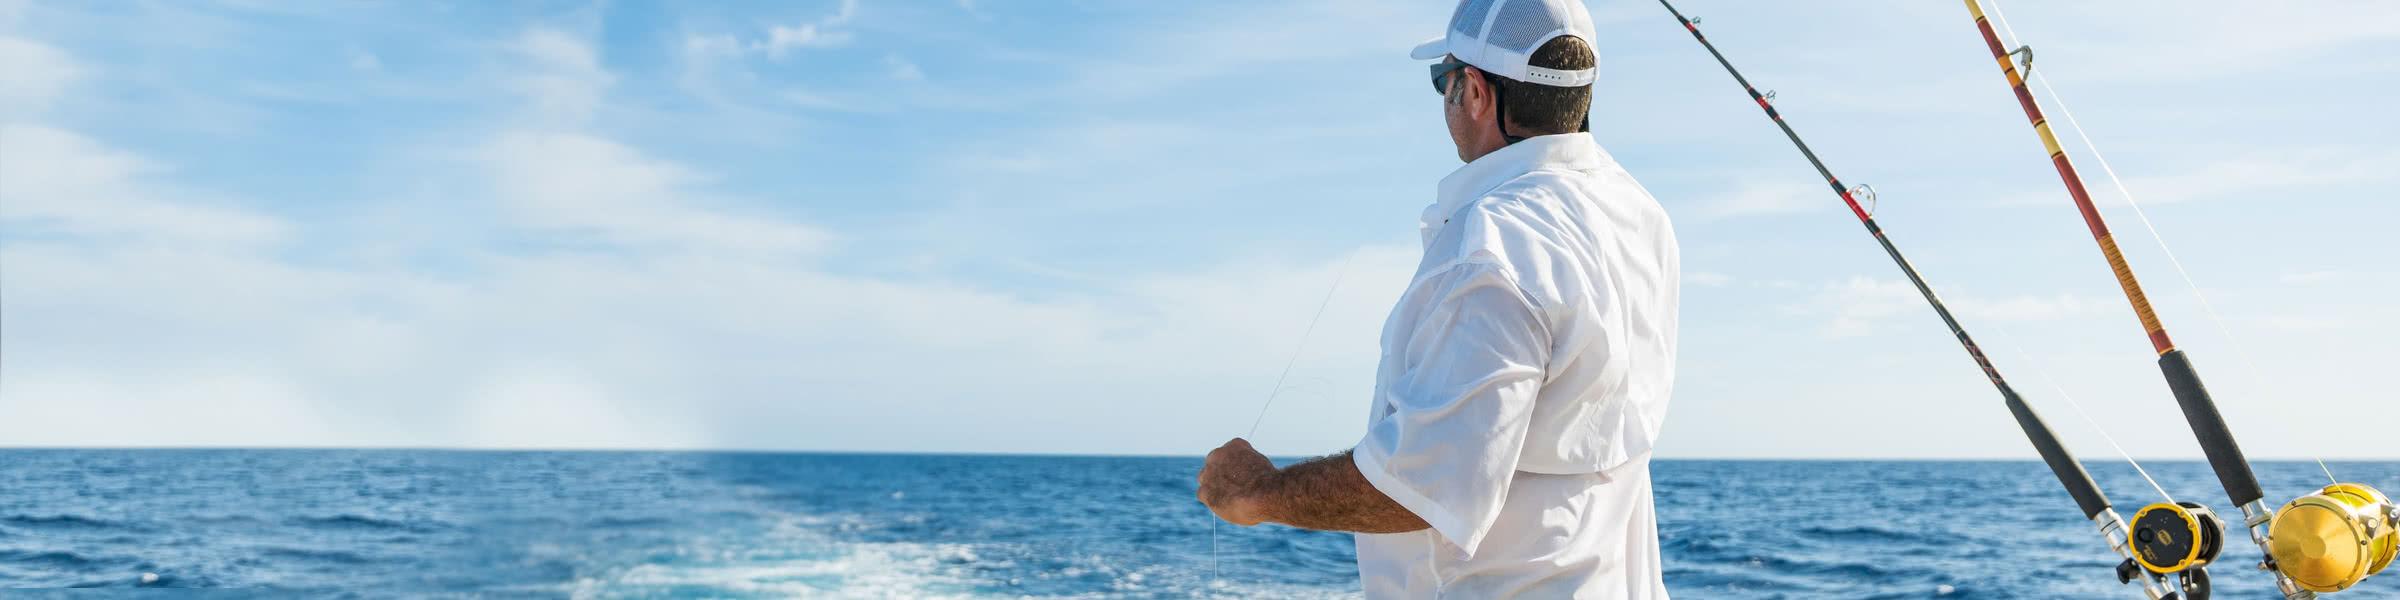 Lowrance Fishfinder